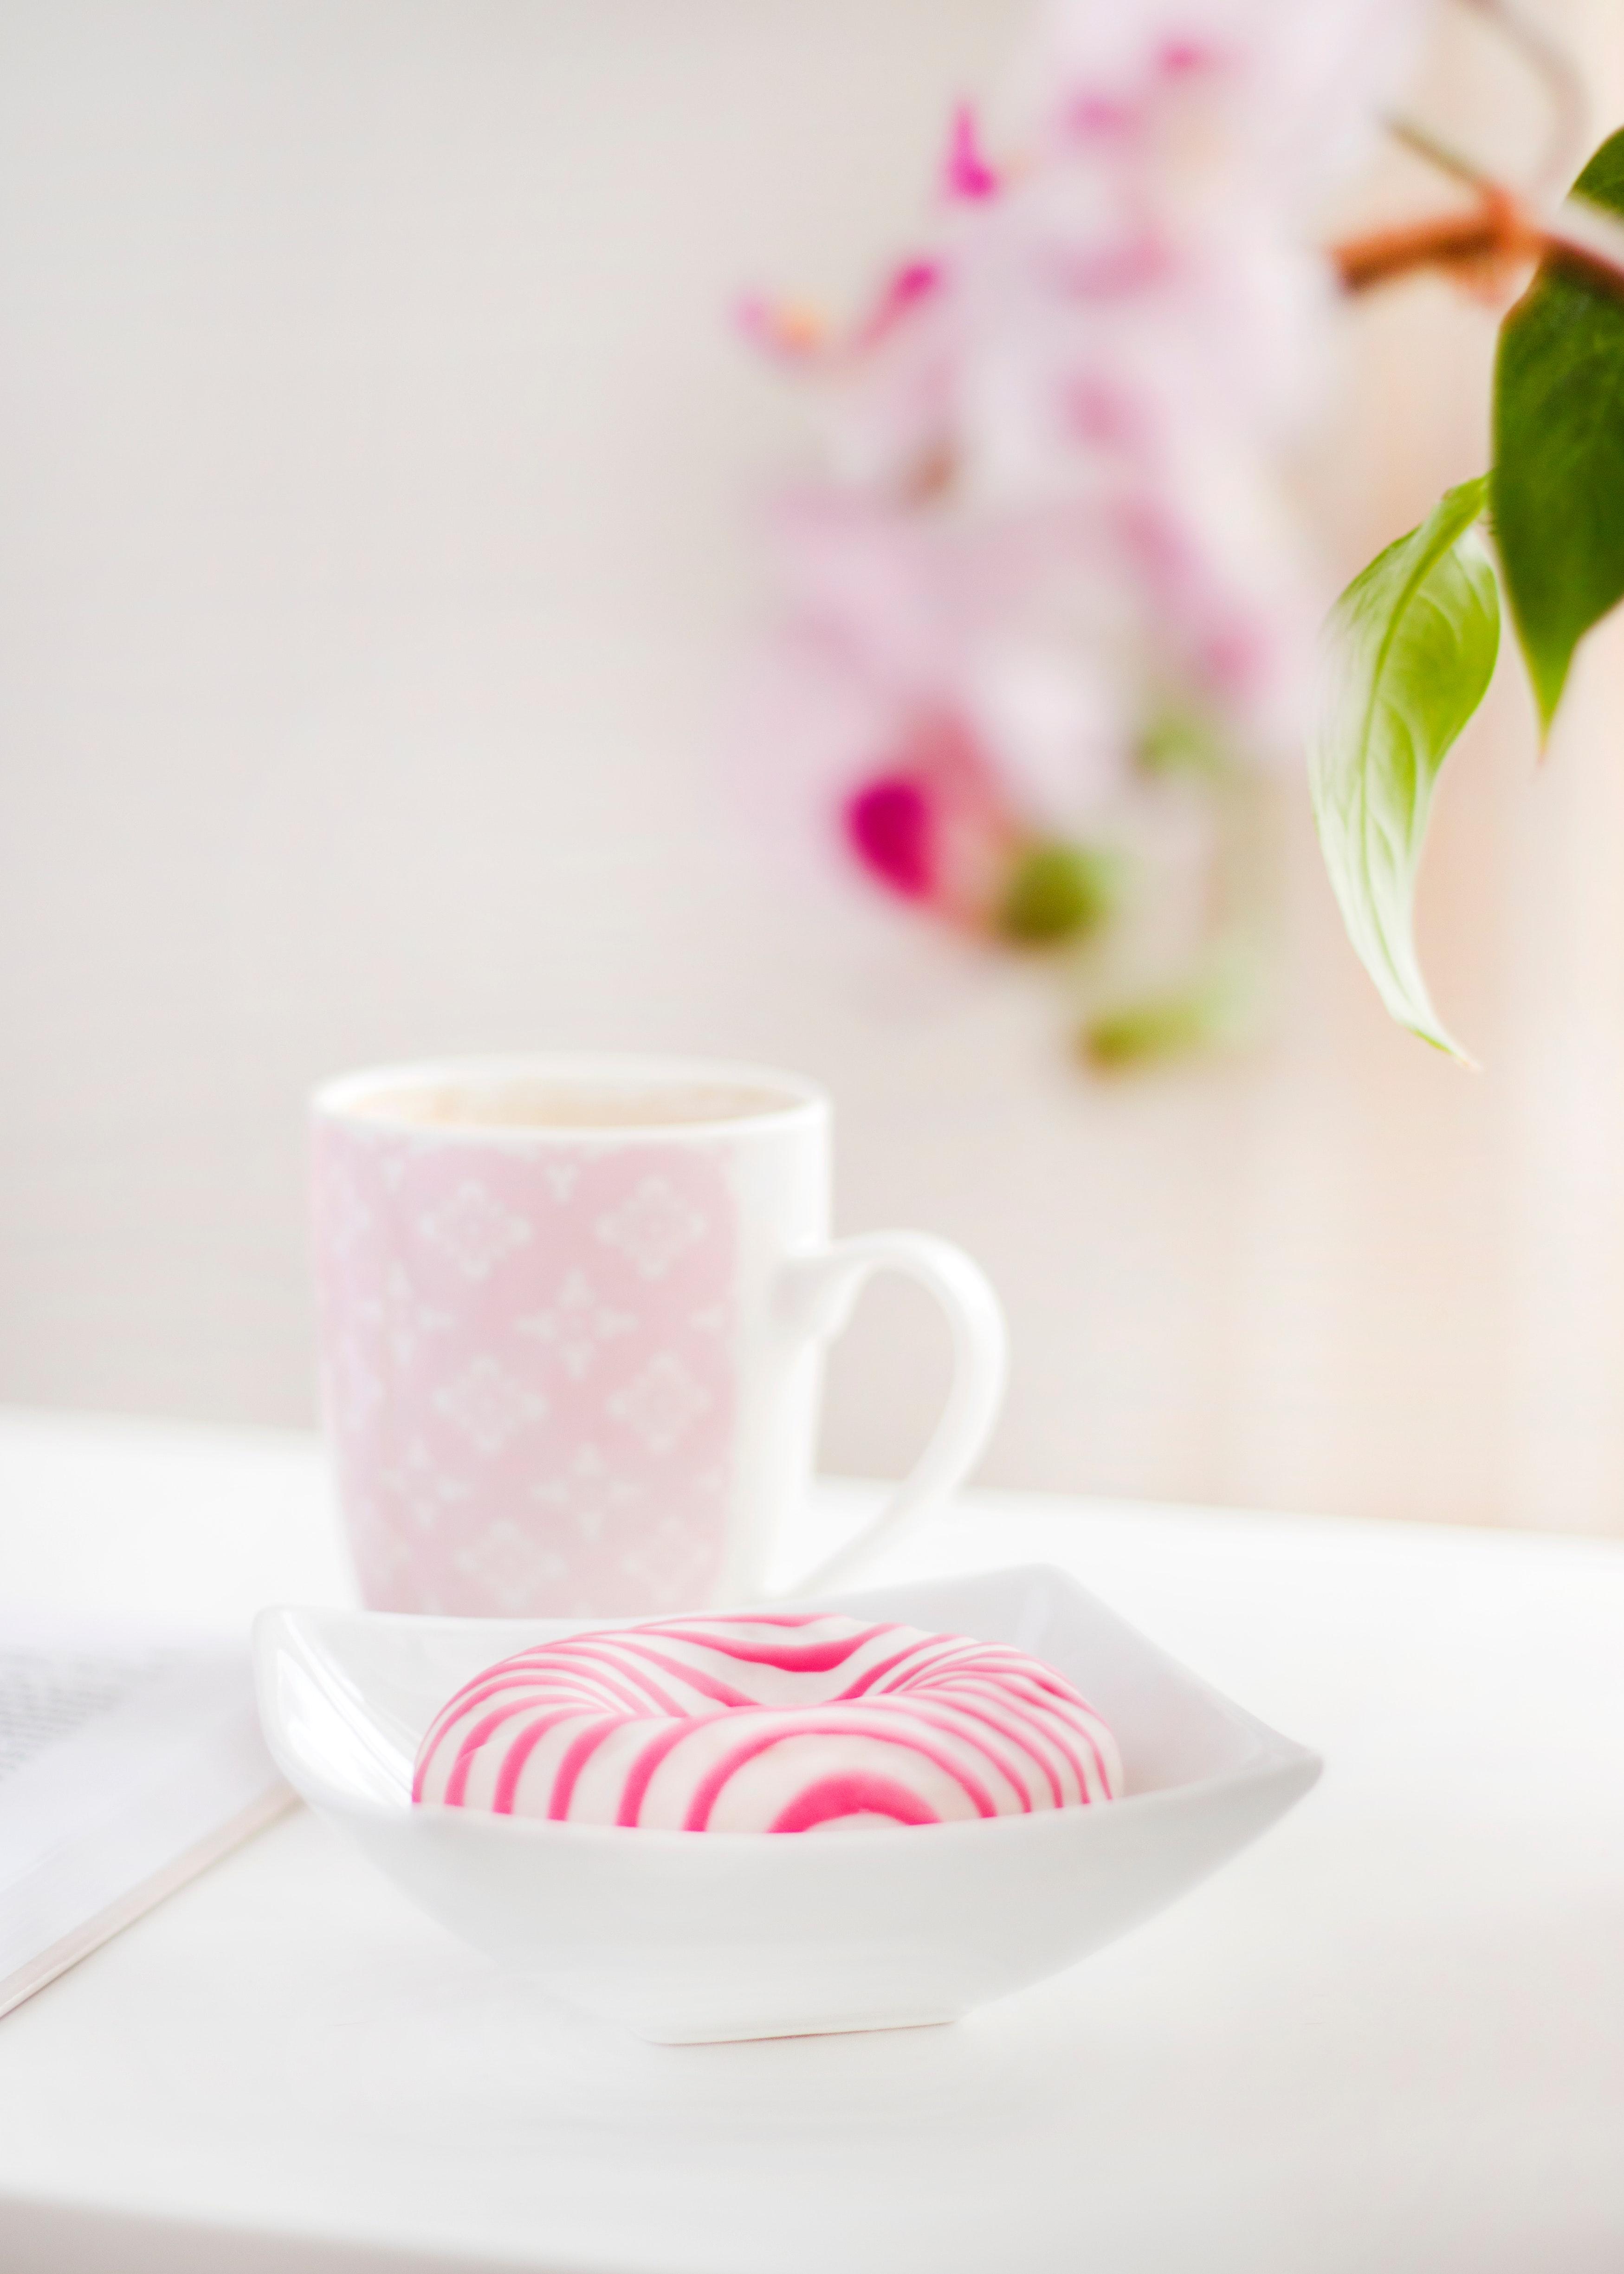 White and Pink Ceramic Mug, Decoration, Table, Pink, Mug, HQ Photo